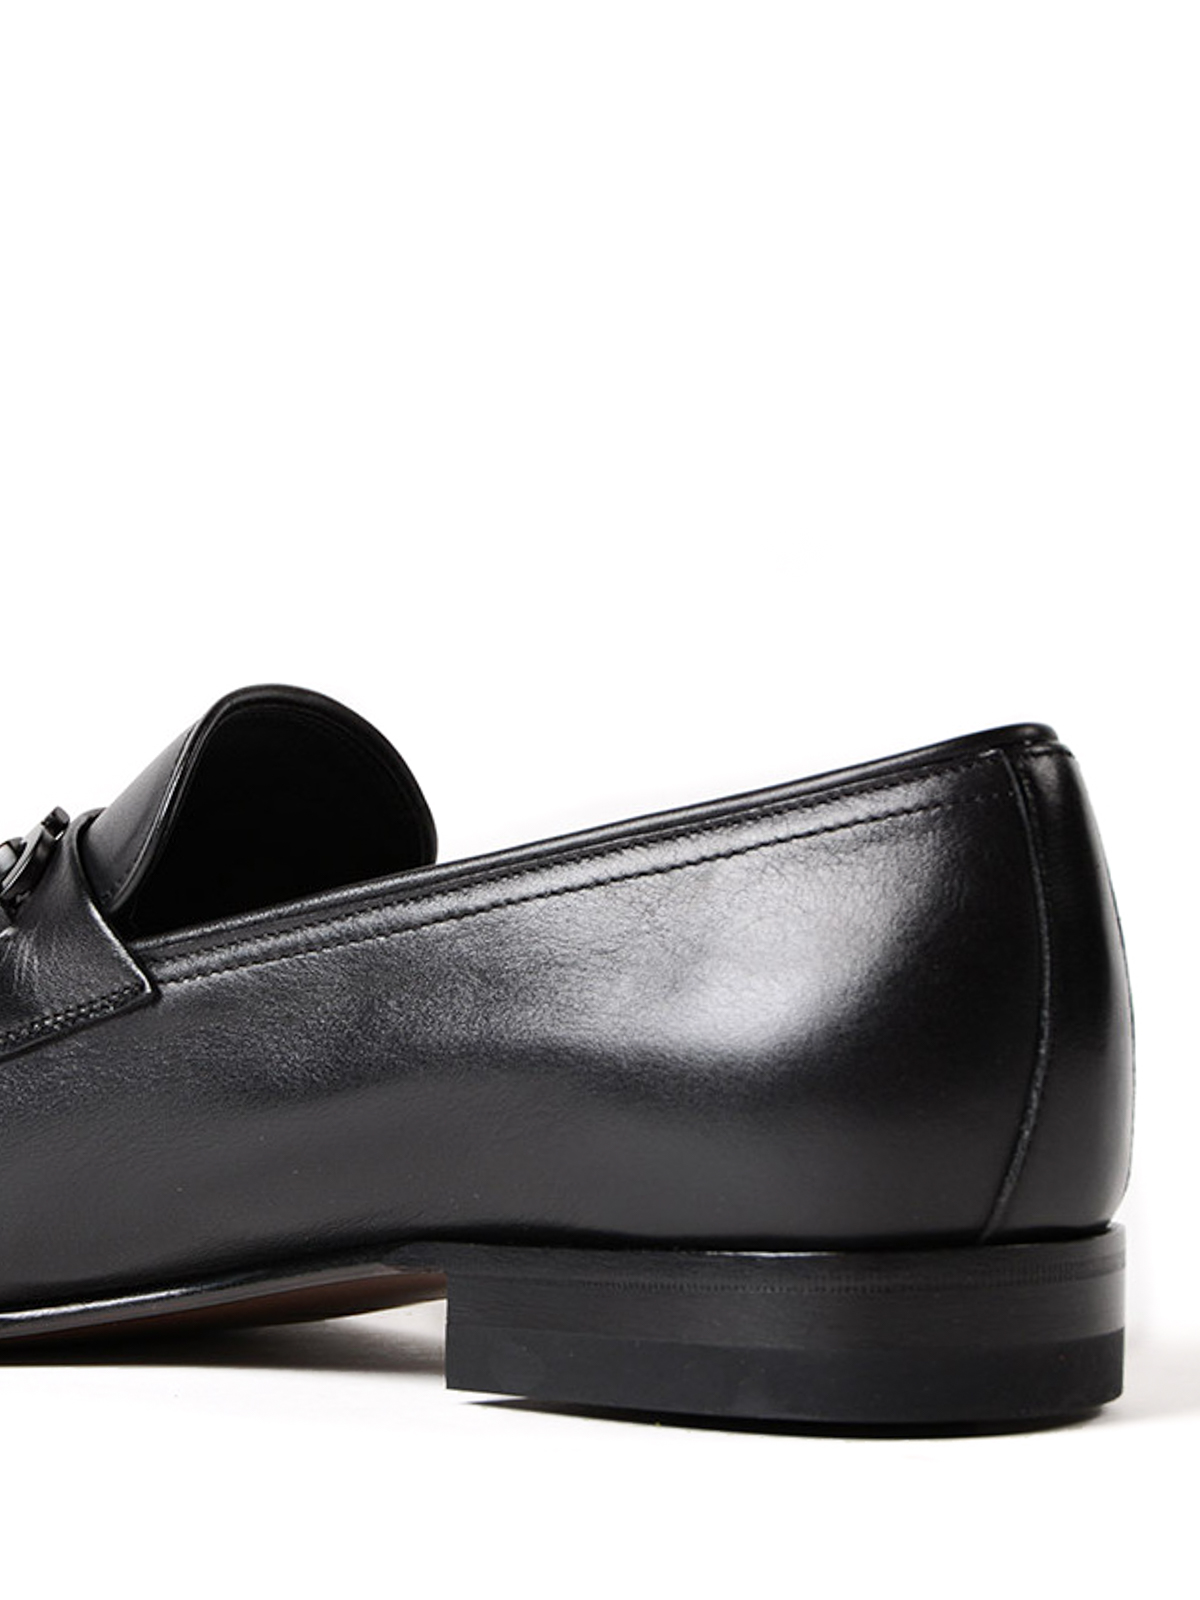 Gancini bit black leather loafers shop online: Salvatore Ferragamo